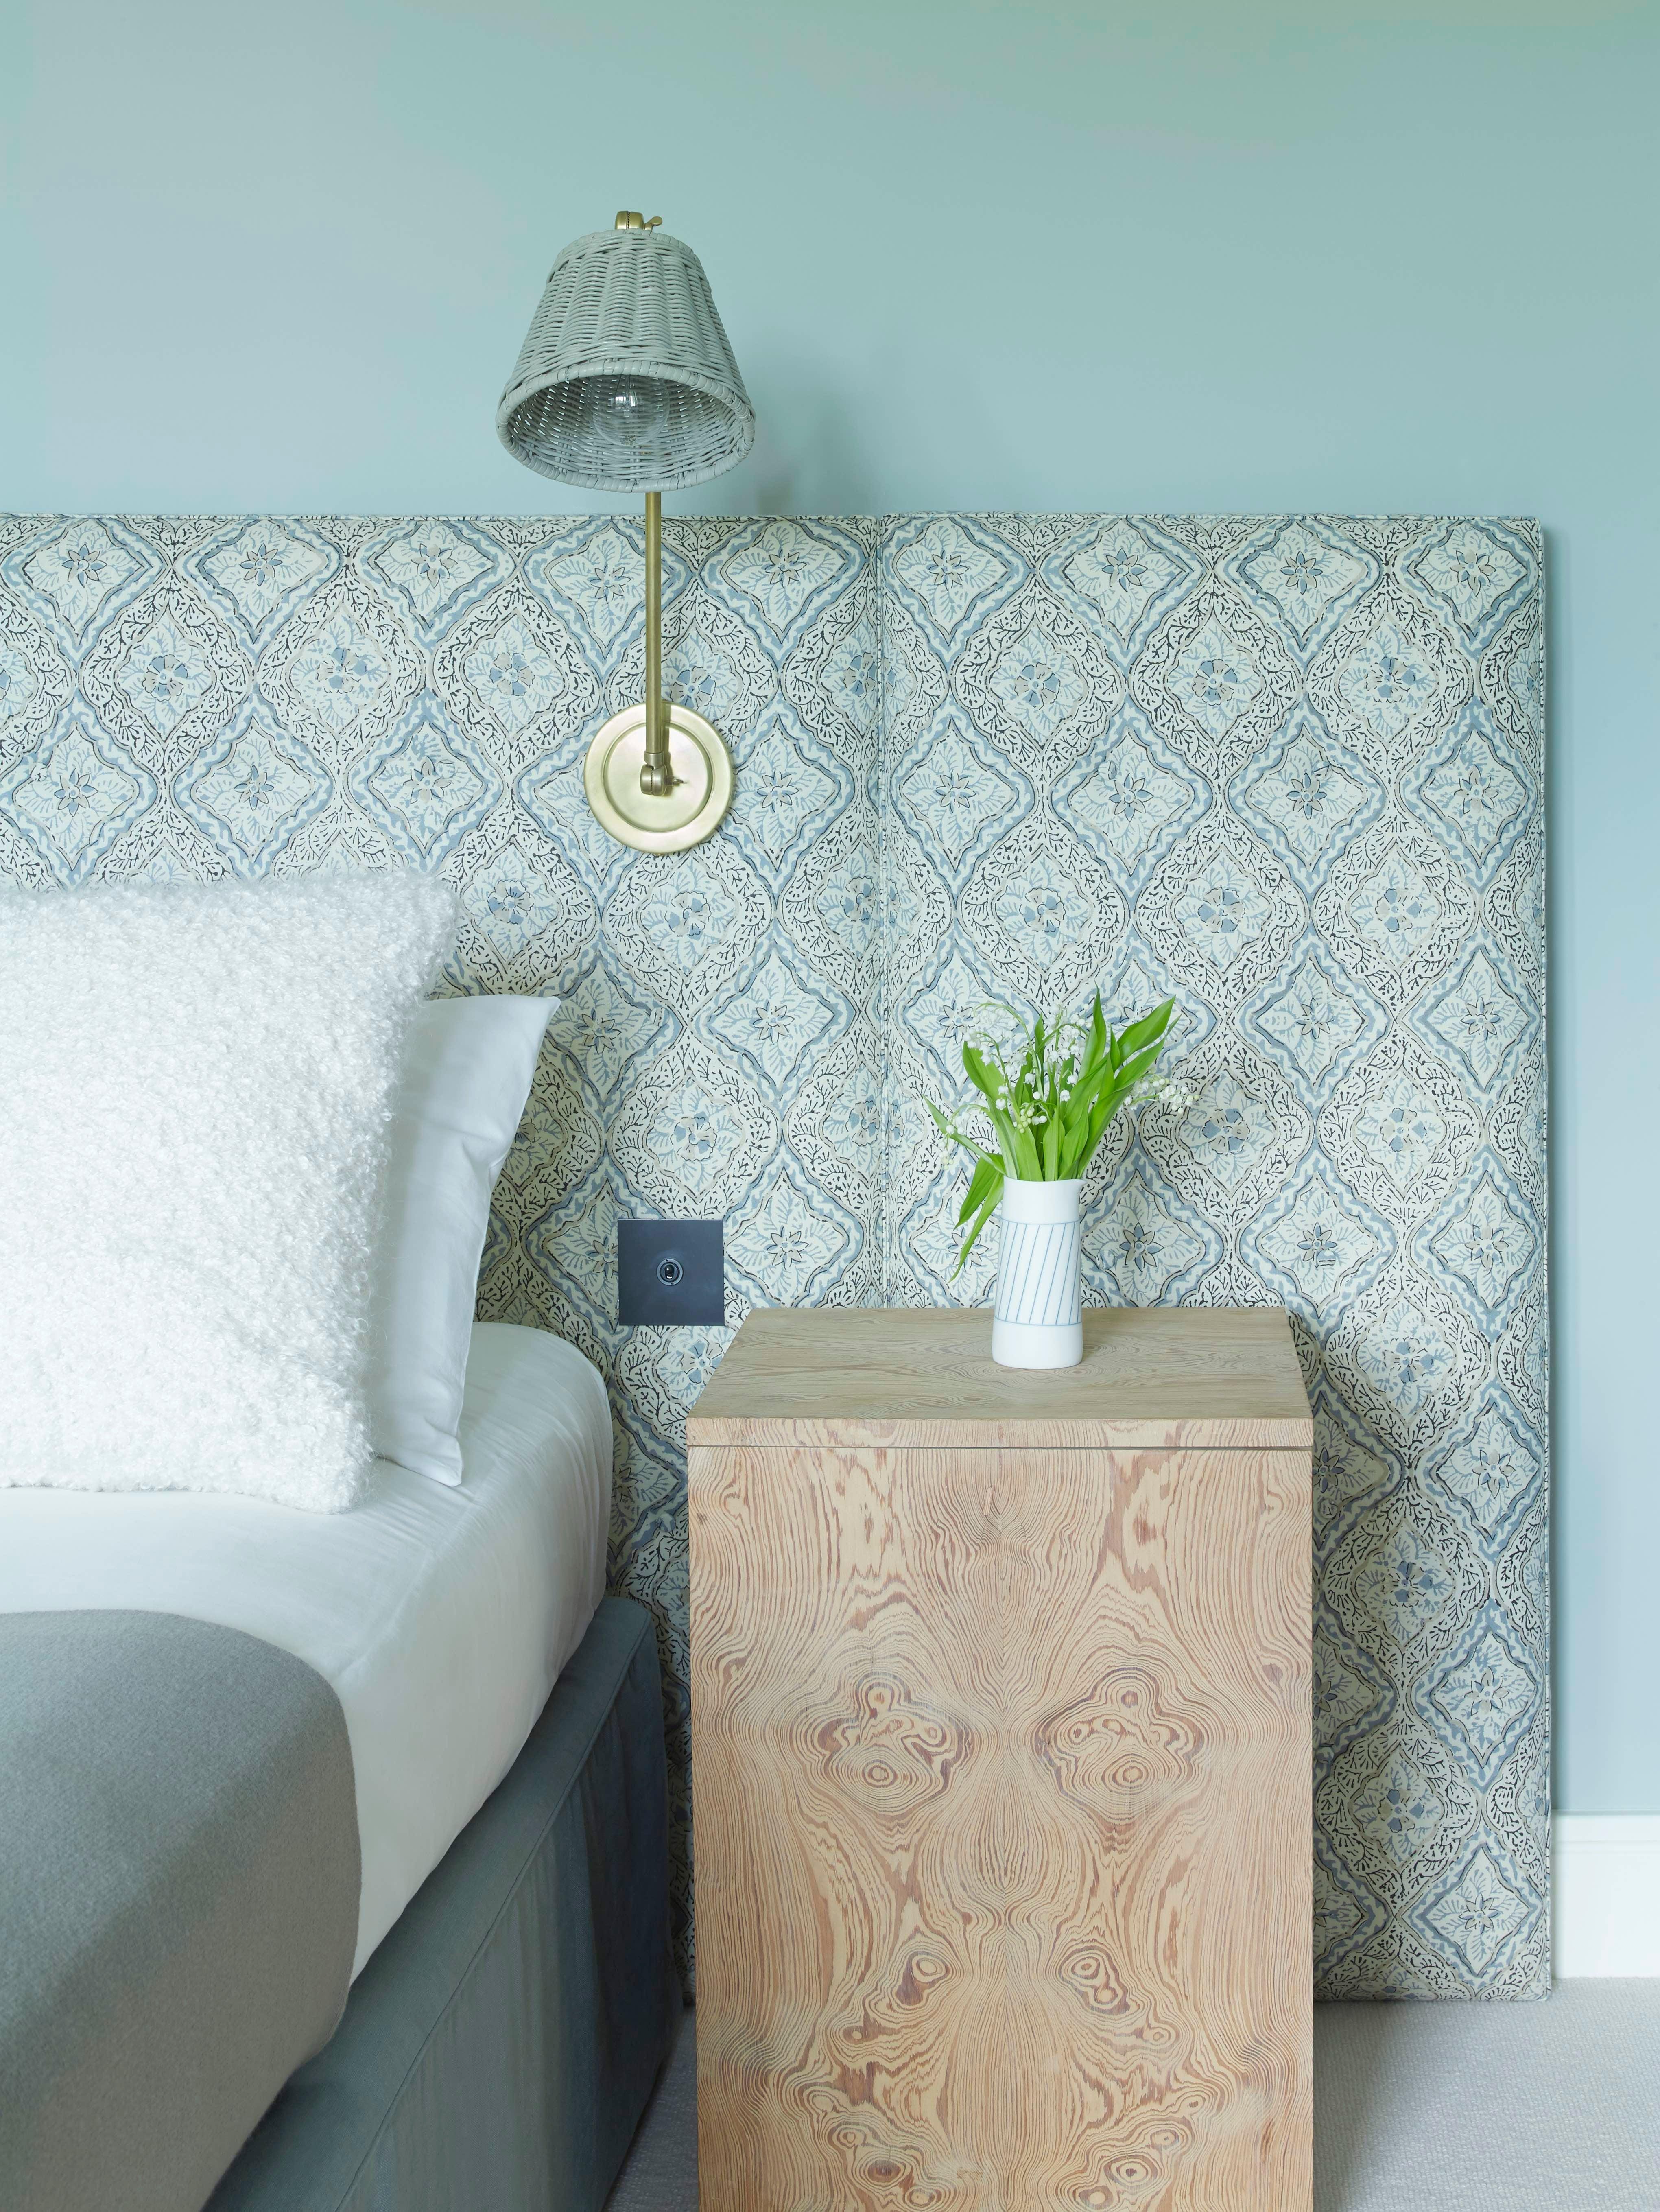 bedroom detail by fran hickman design  u0026 interiors on 1stdibs